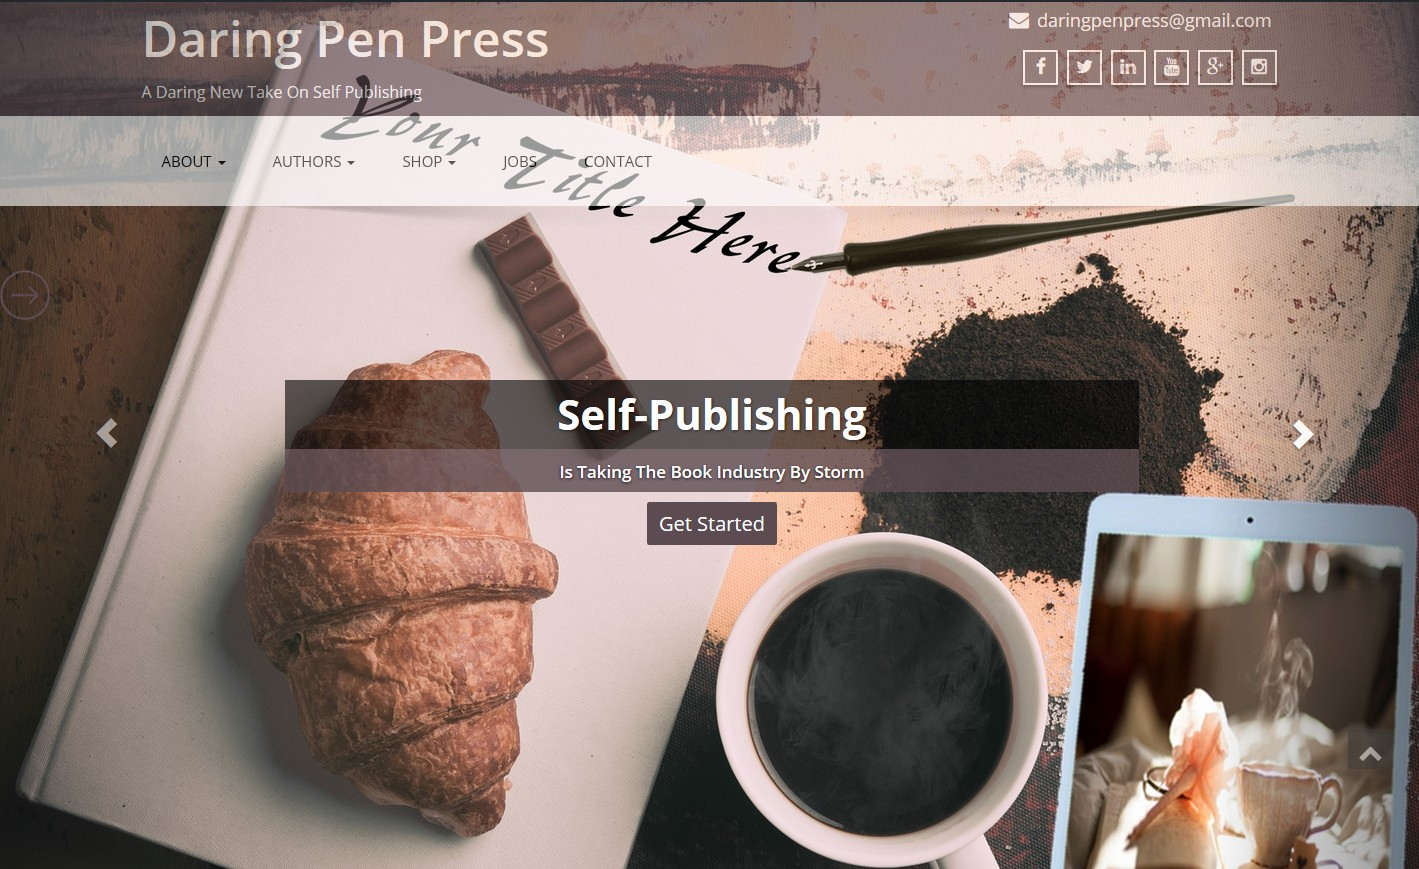 Daring Pen Press Website Design